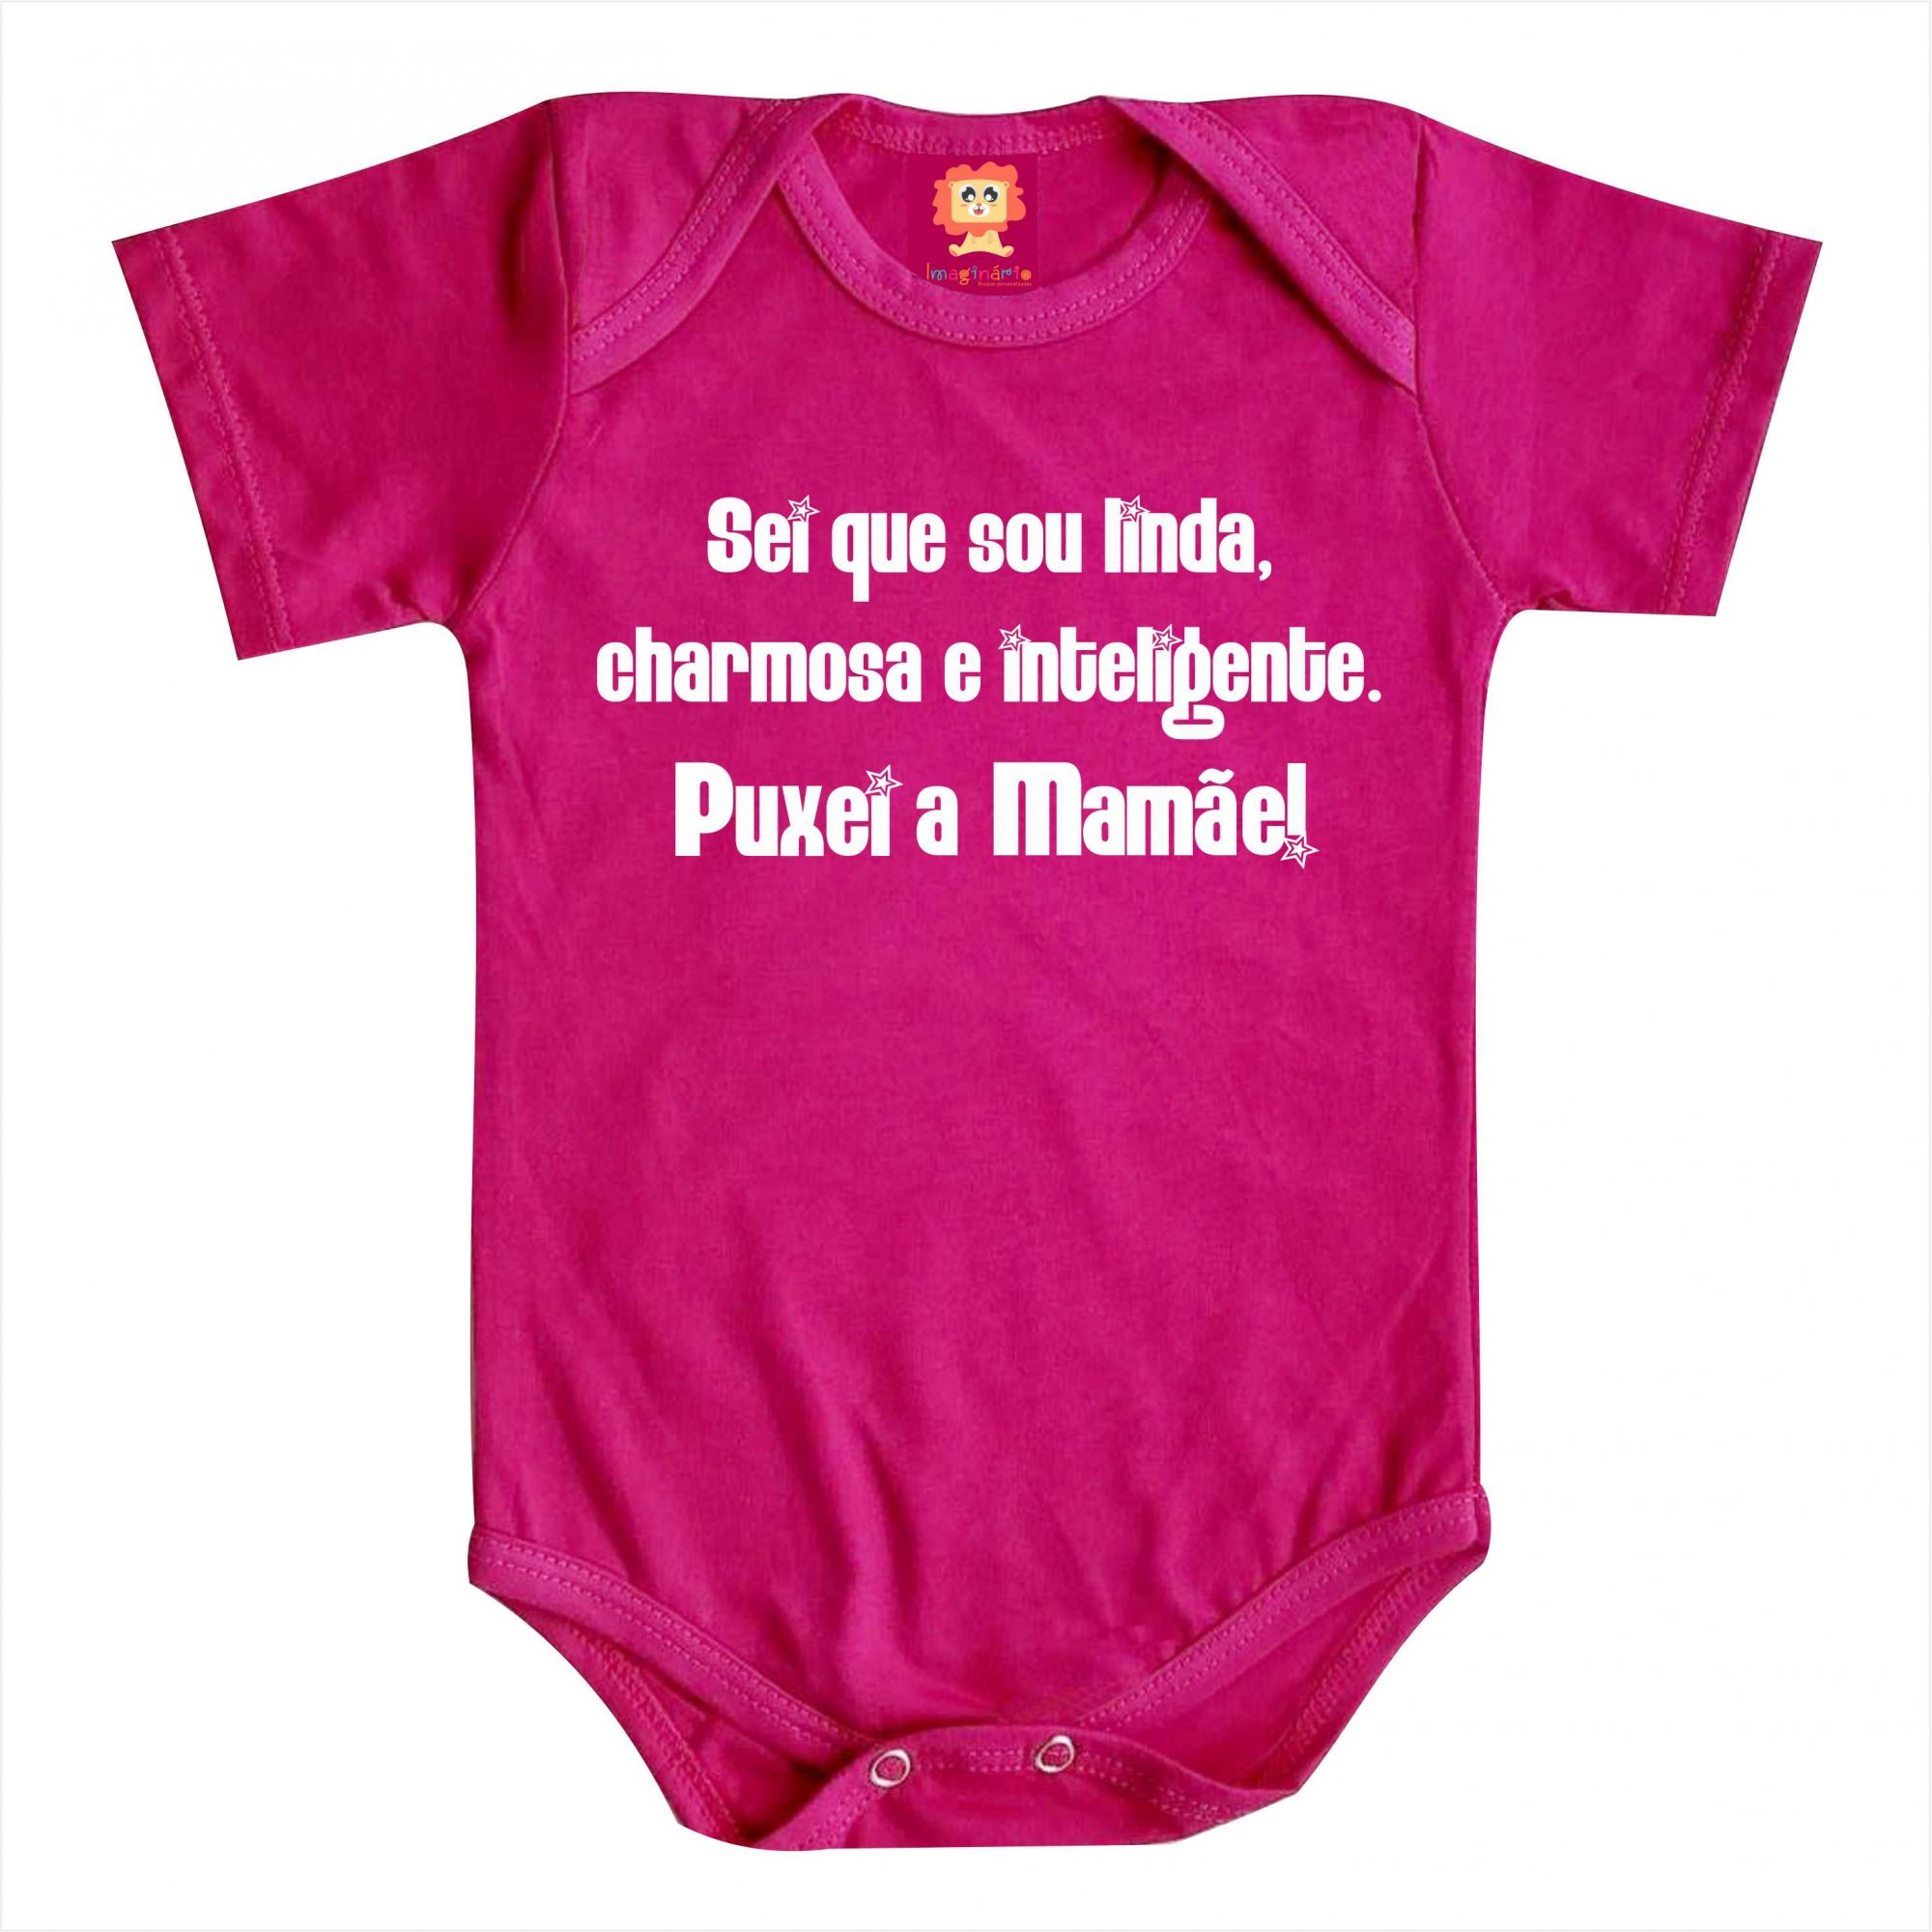 Body de Bebê ou Camiseta Sei Que Sou Linda, Charmosa e Inteligente Puxei a Mamãe